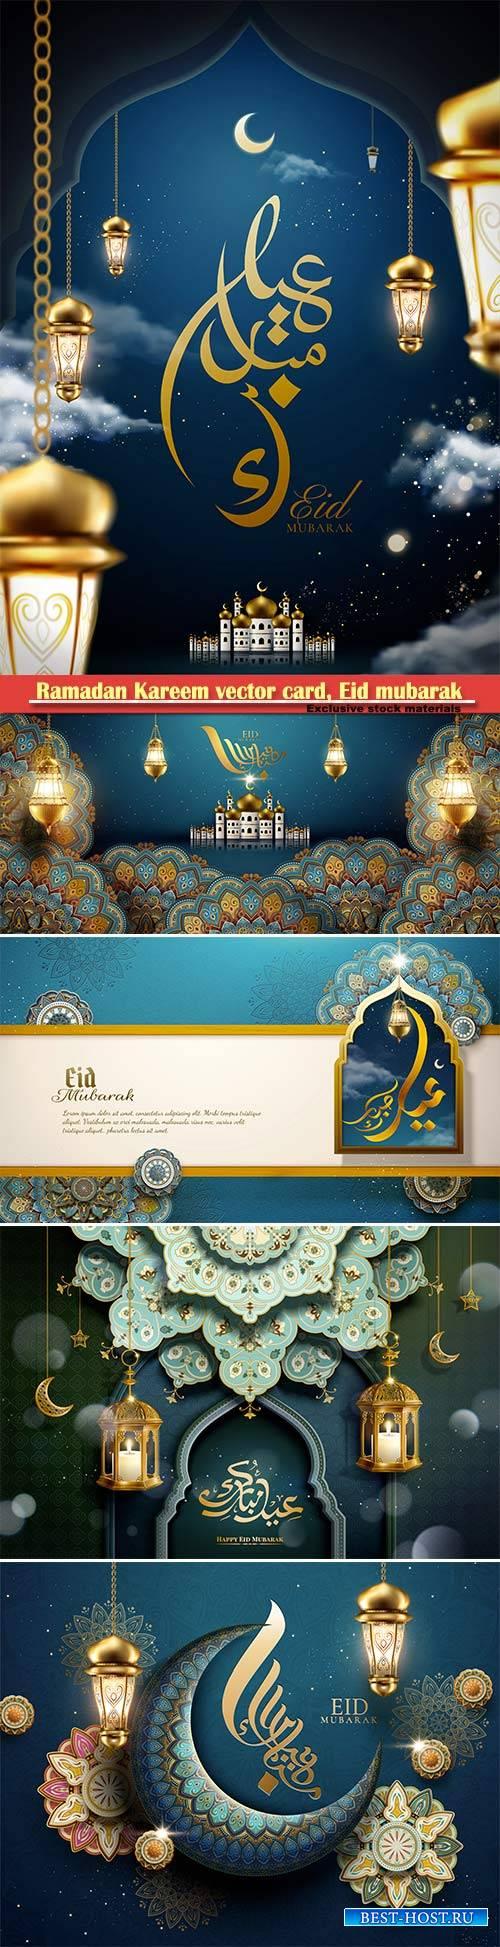 Ramadan Kareem vector card, Eid mubarak calligraphy design templates # 14